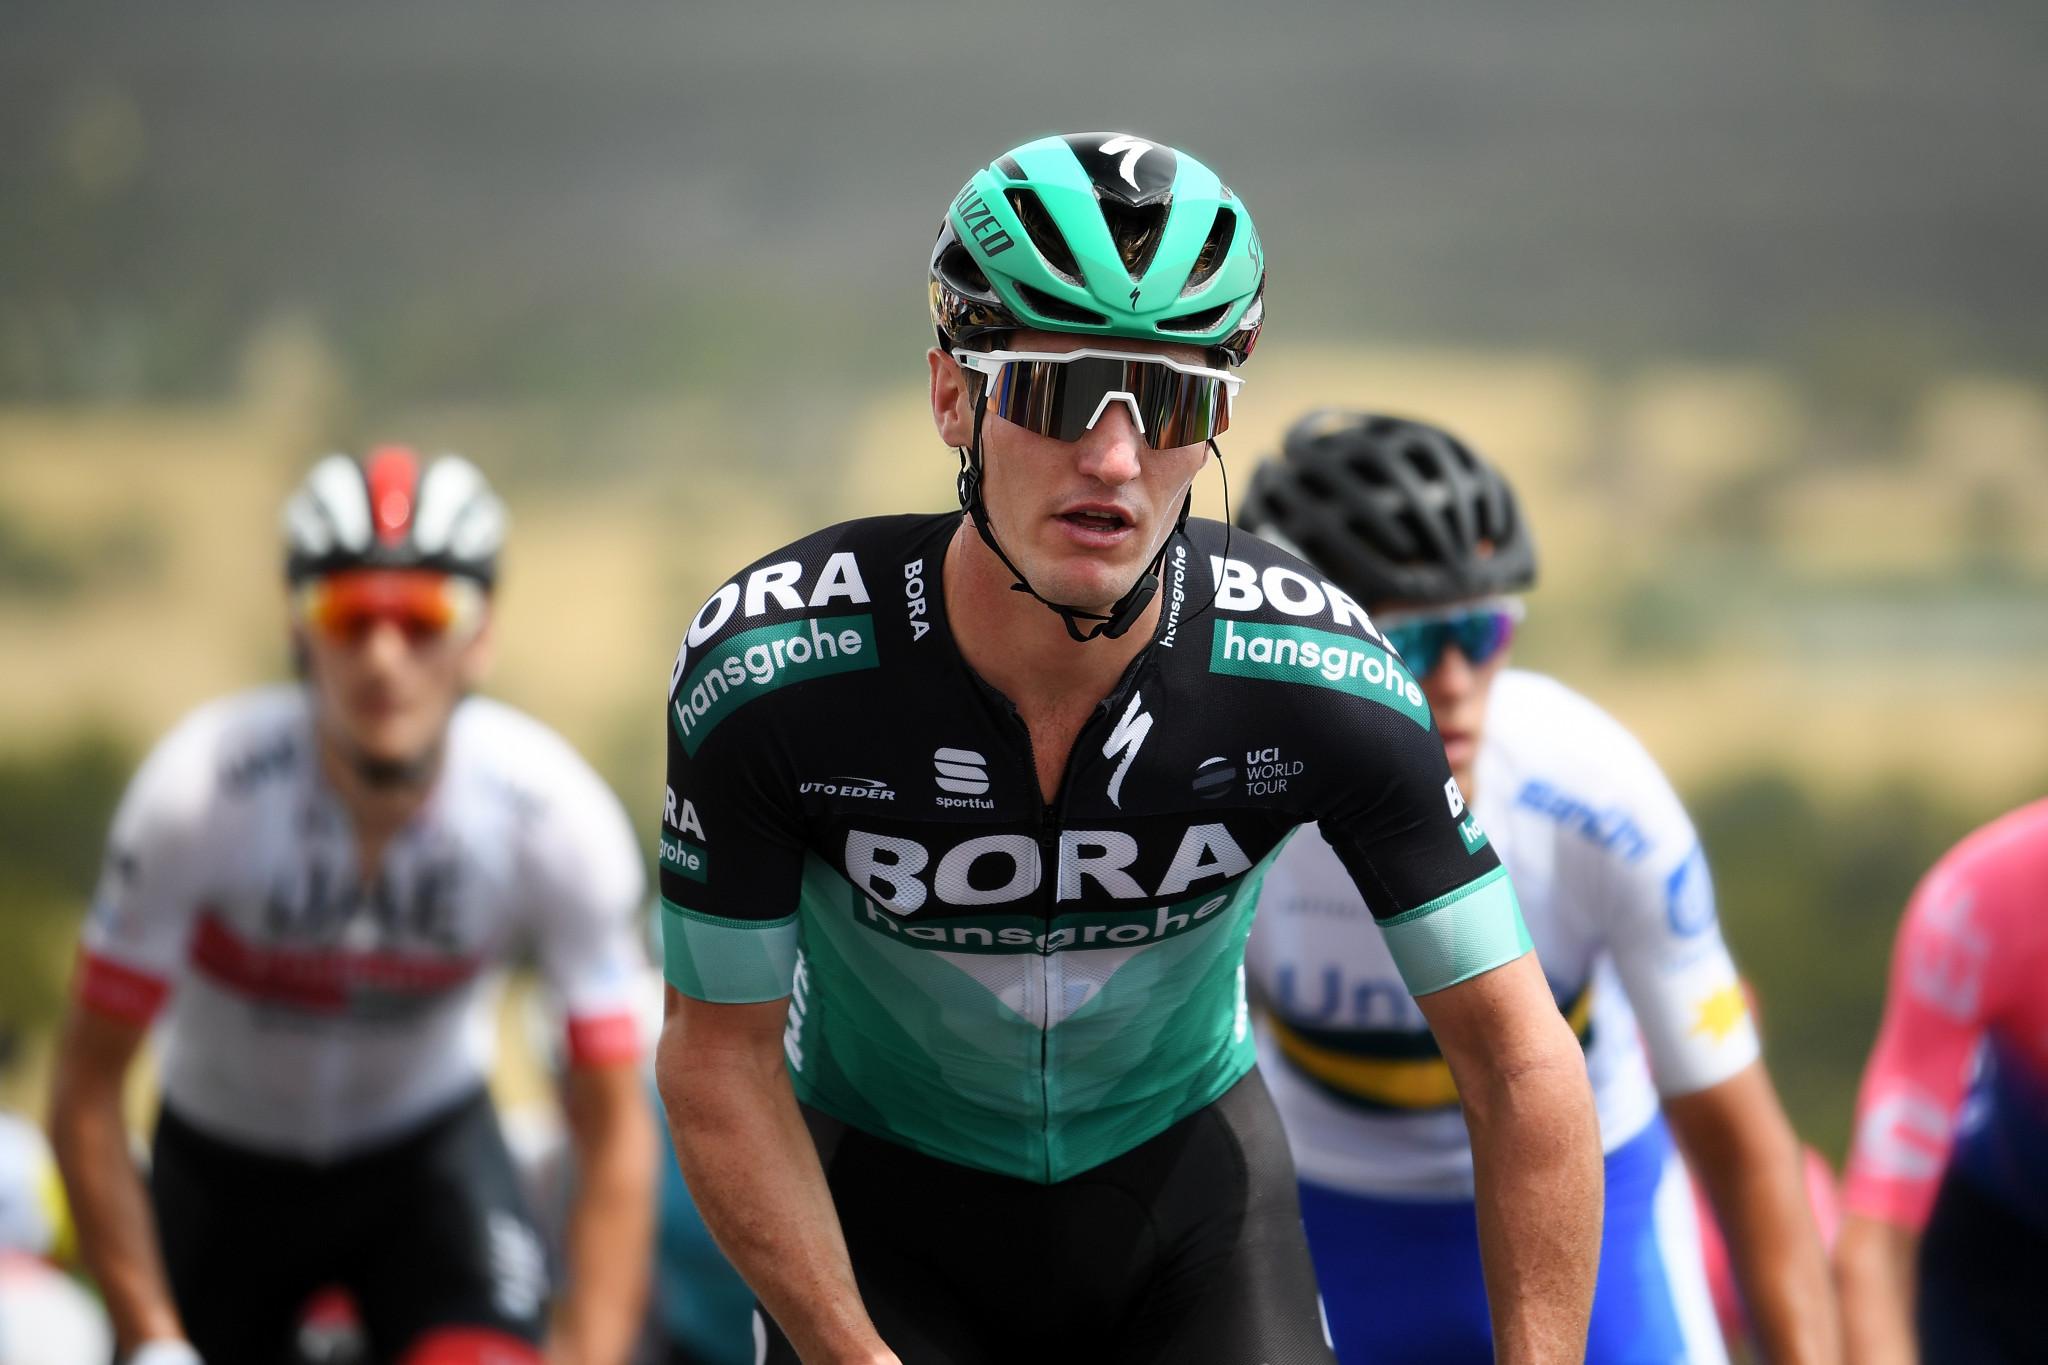 McCarthy eyes repeat win at Cadel Evans Great Ocean Road Race